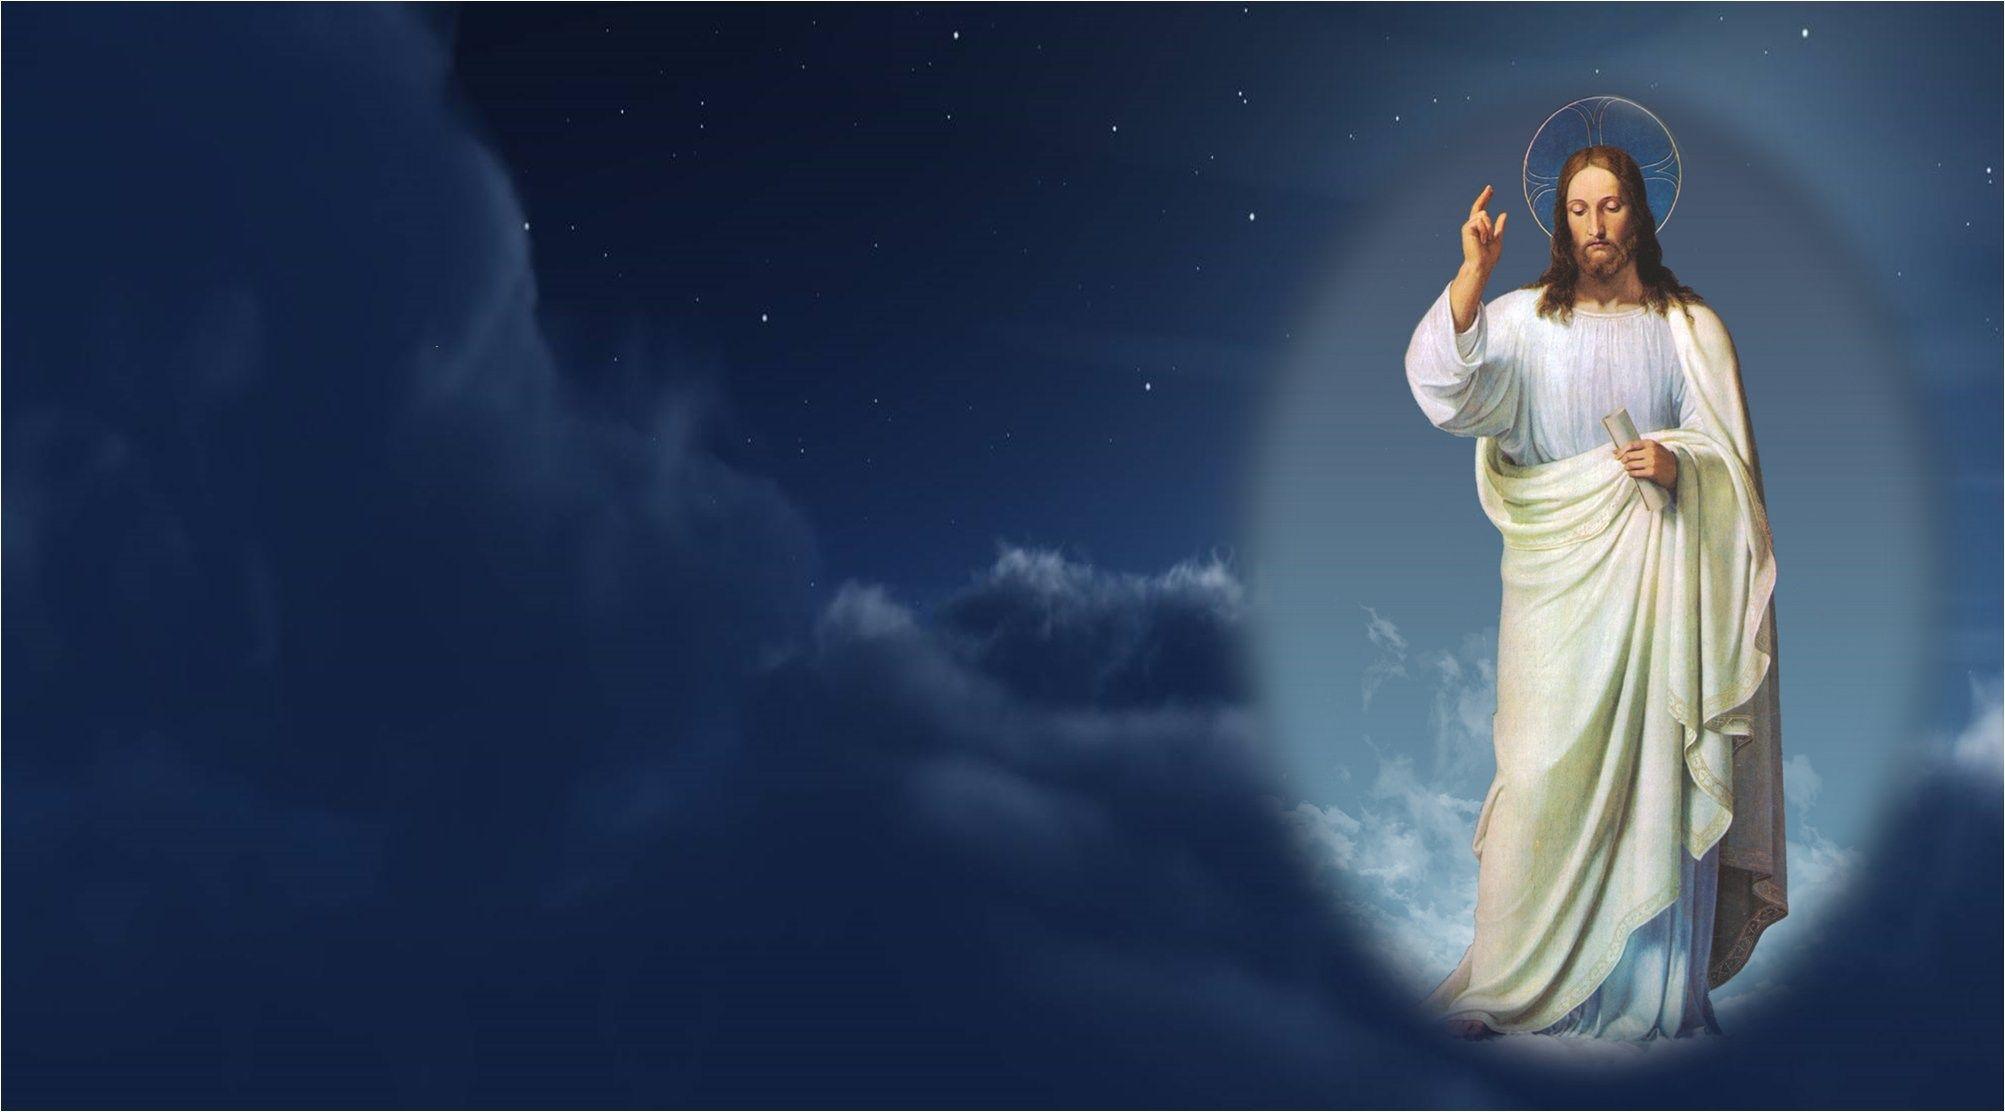 Jesus Pictures For Large Desktop Jesus Wallpaper Jesus Images Jesus Christ Painting